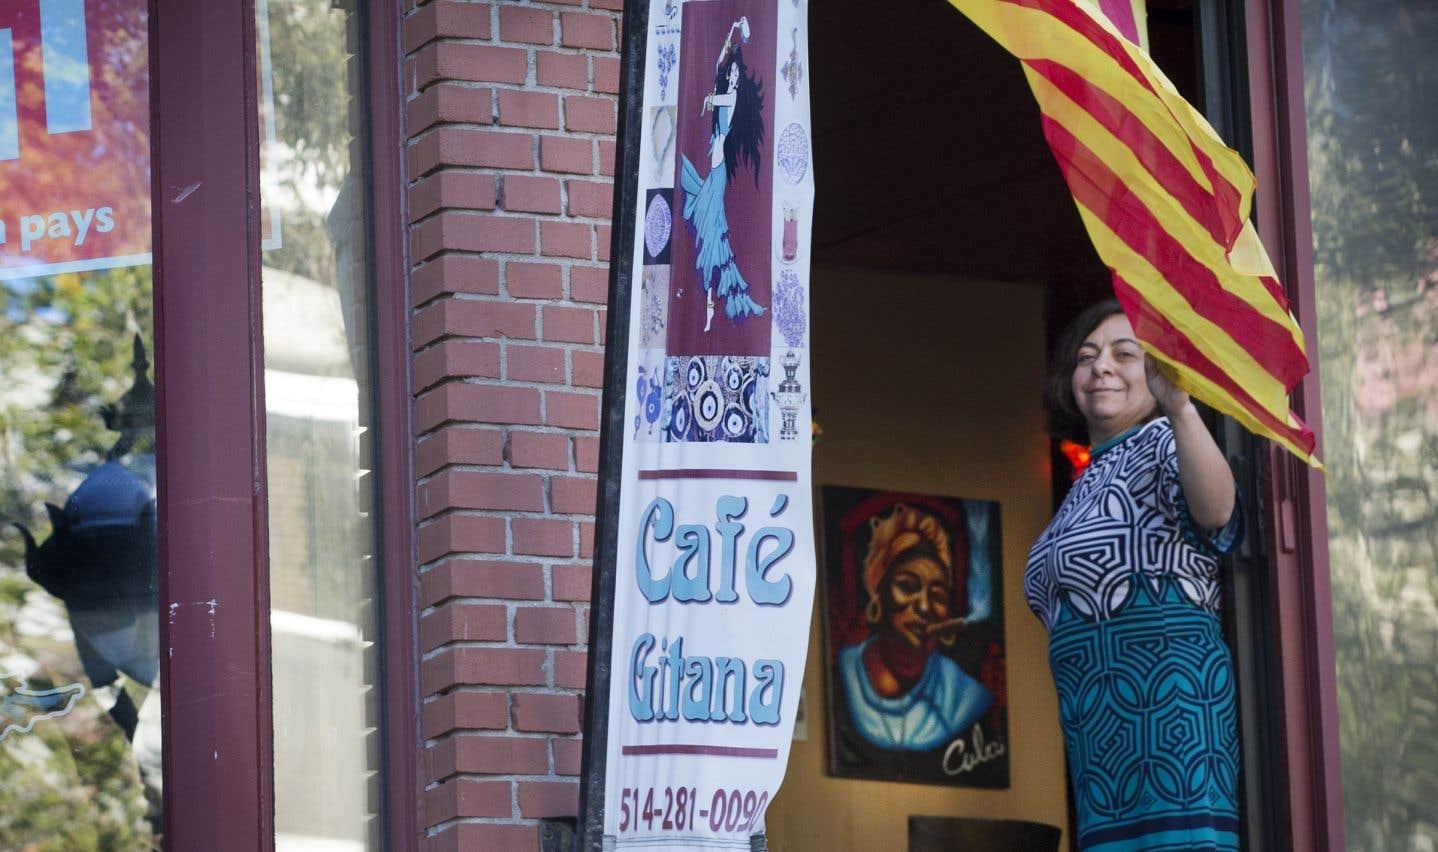 Catalogne: des «gestes de violence» condamnés